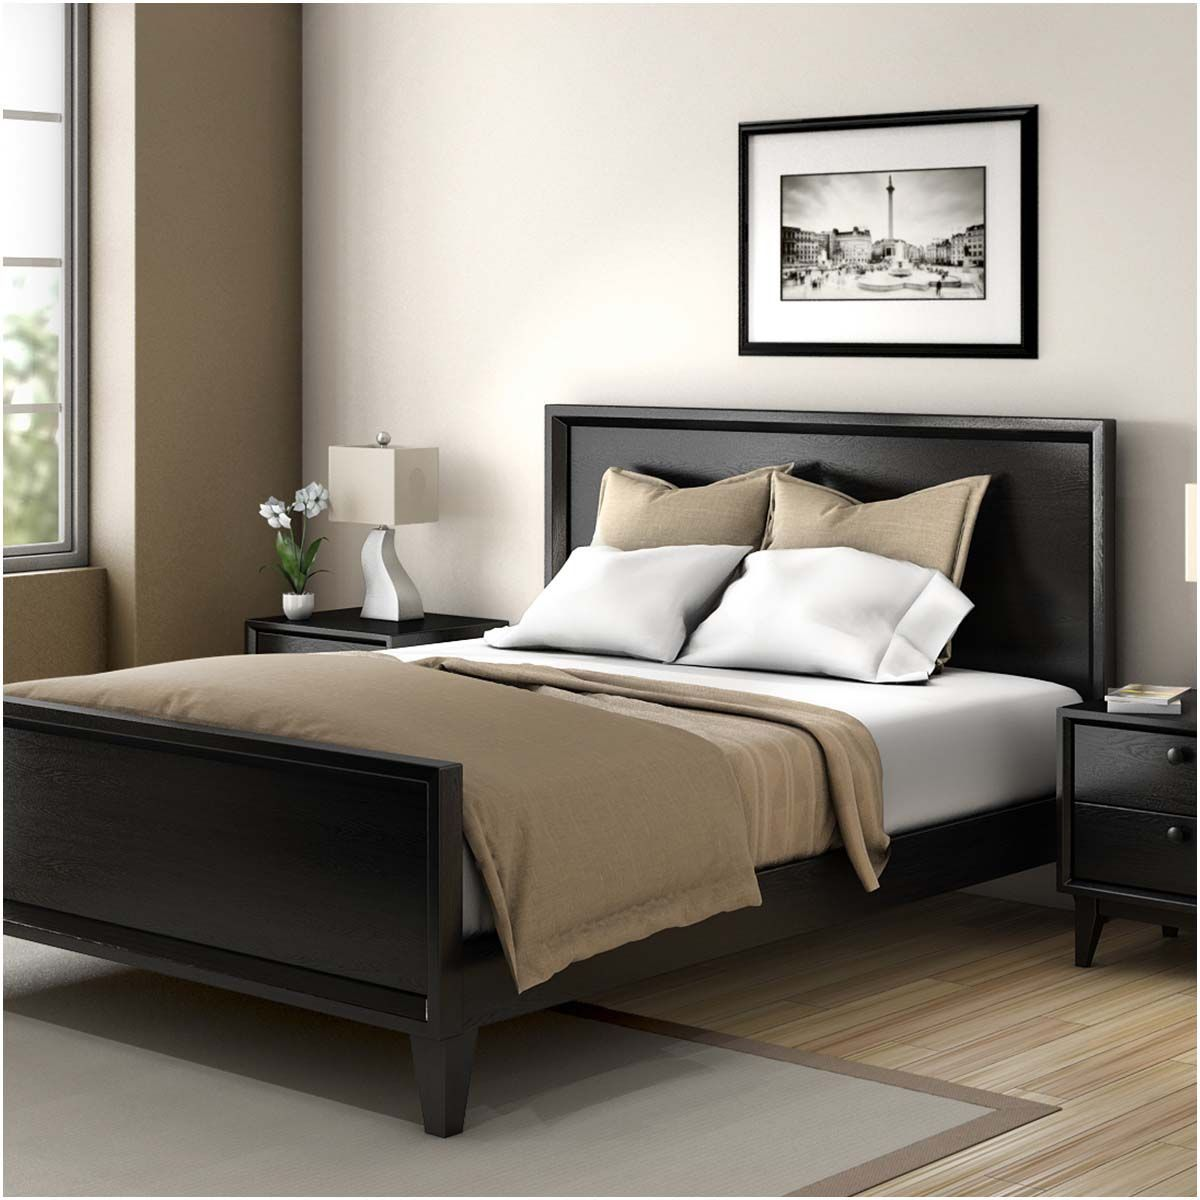 Modern Simplicity Mocha Solid Wood Platform Bed w Foot